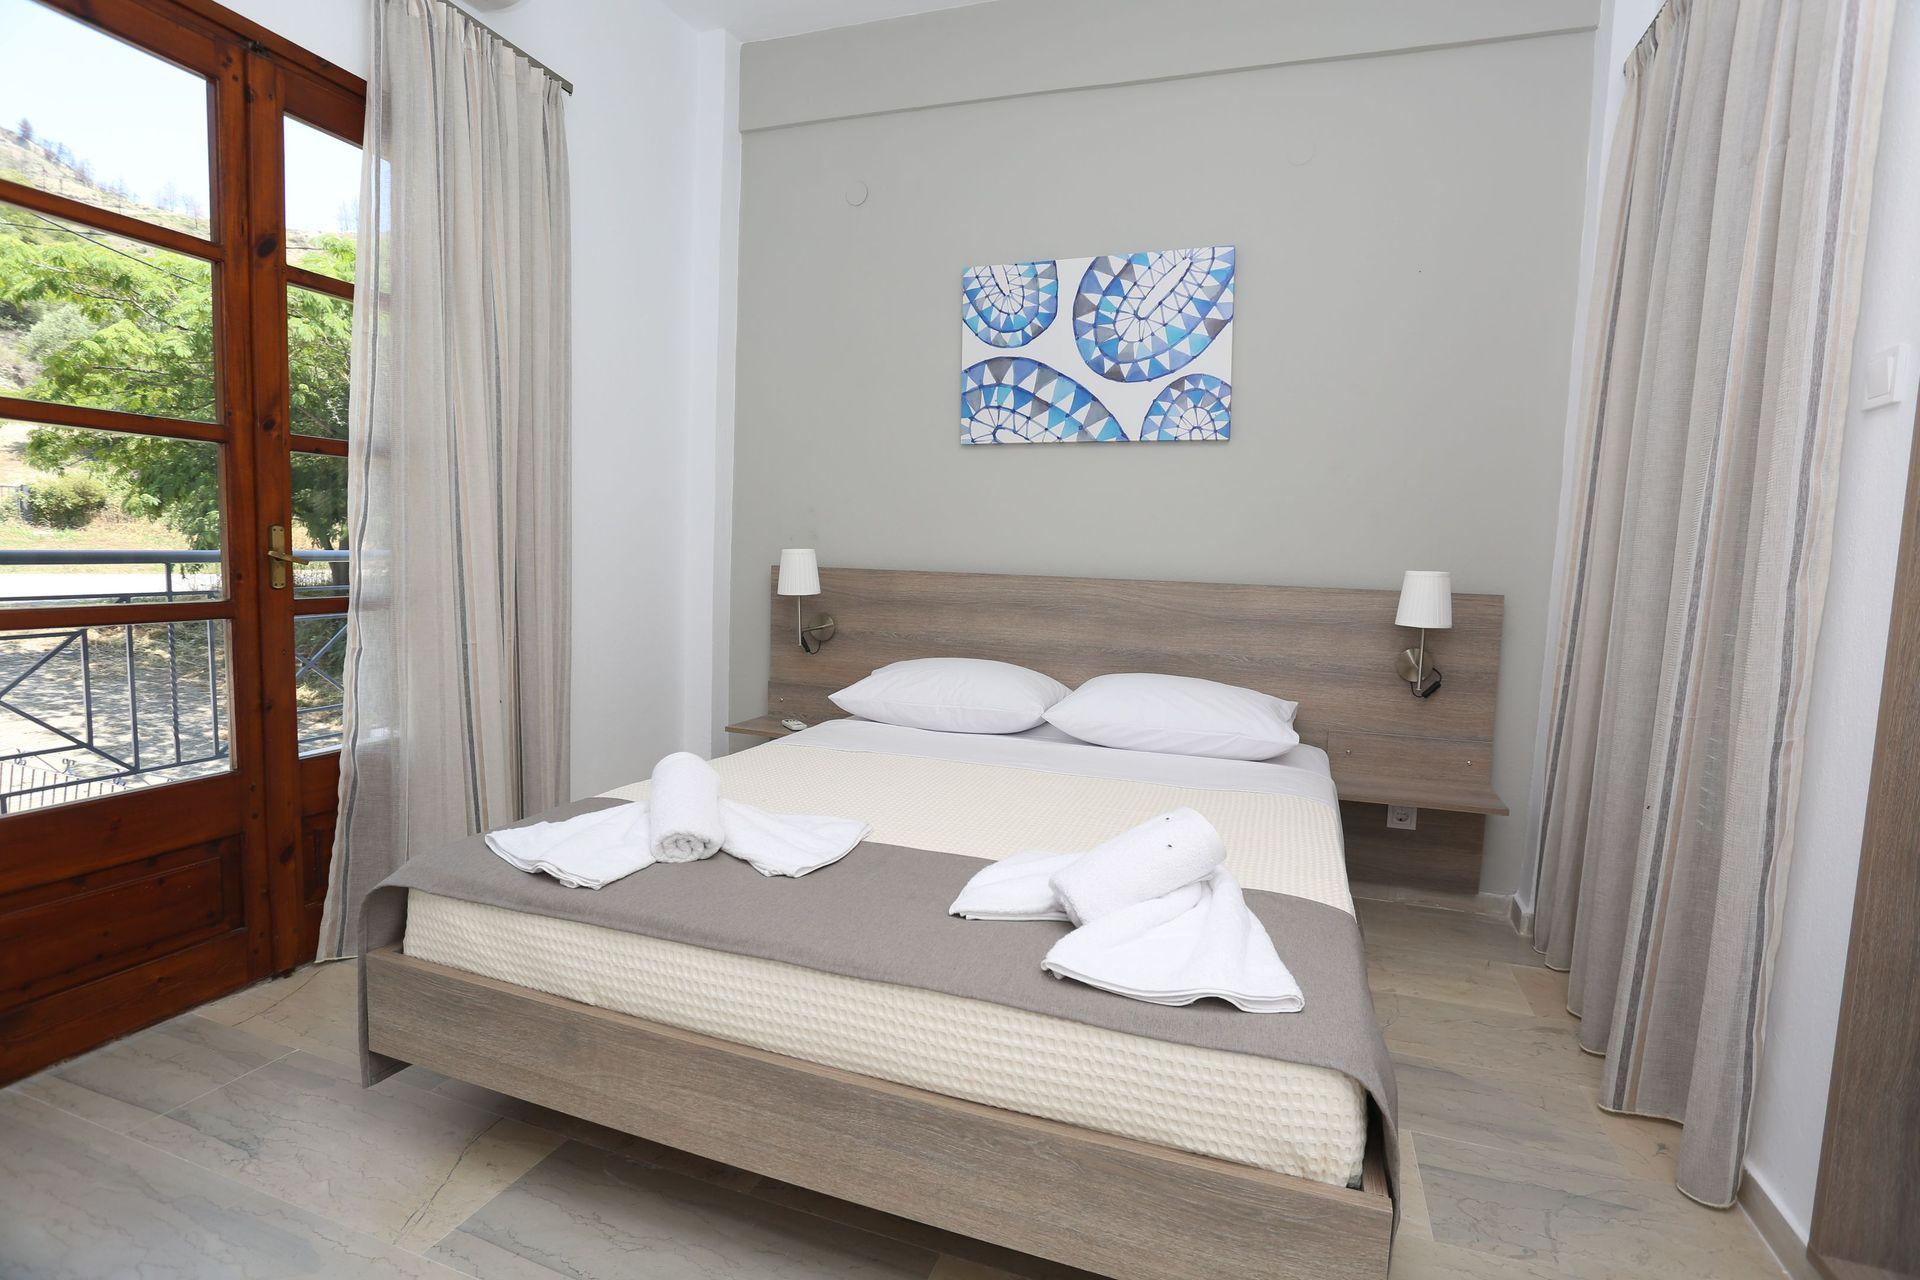 Astron Hotel - Μόλα Καλύβα, Χαλκιδική ✦ -21% ✦ 2 Ημέρες